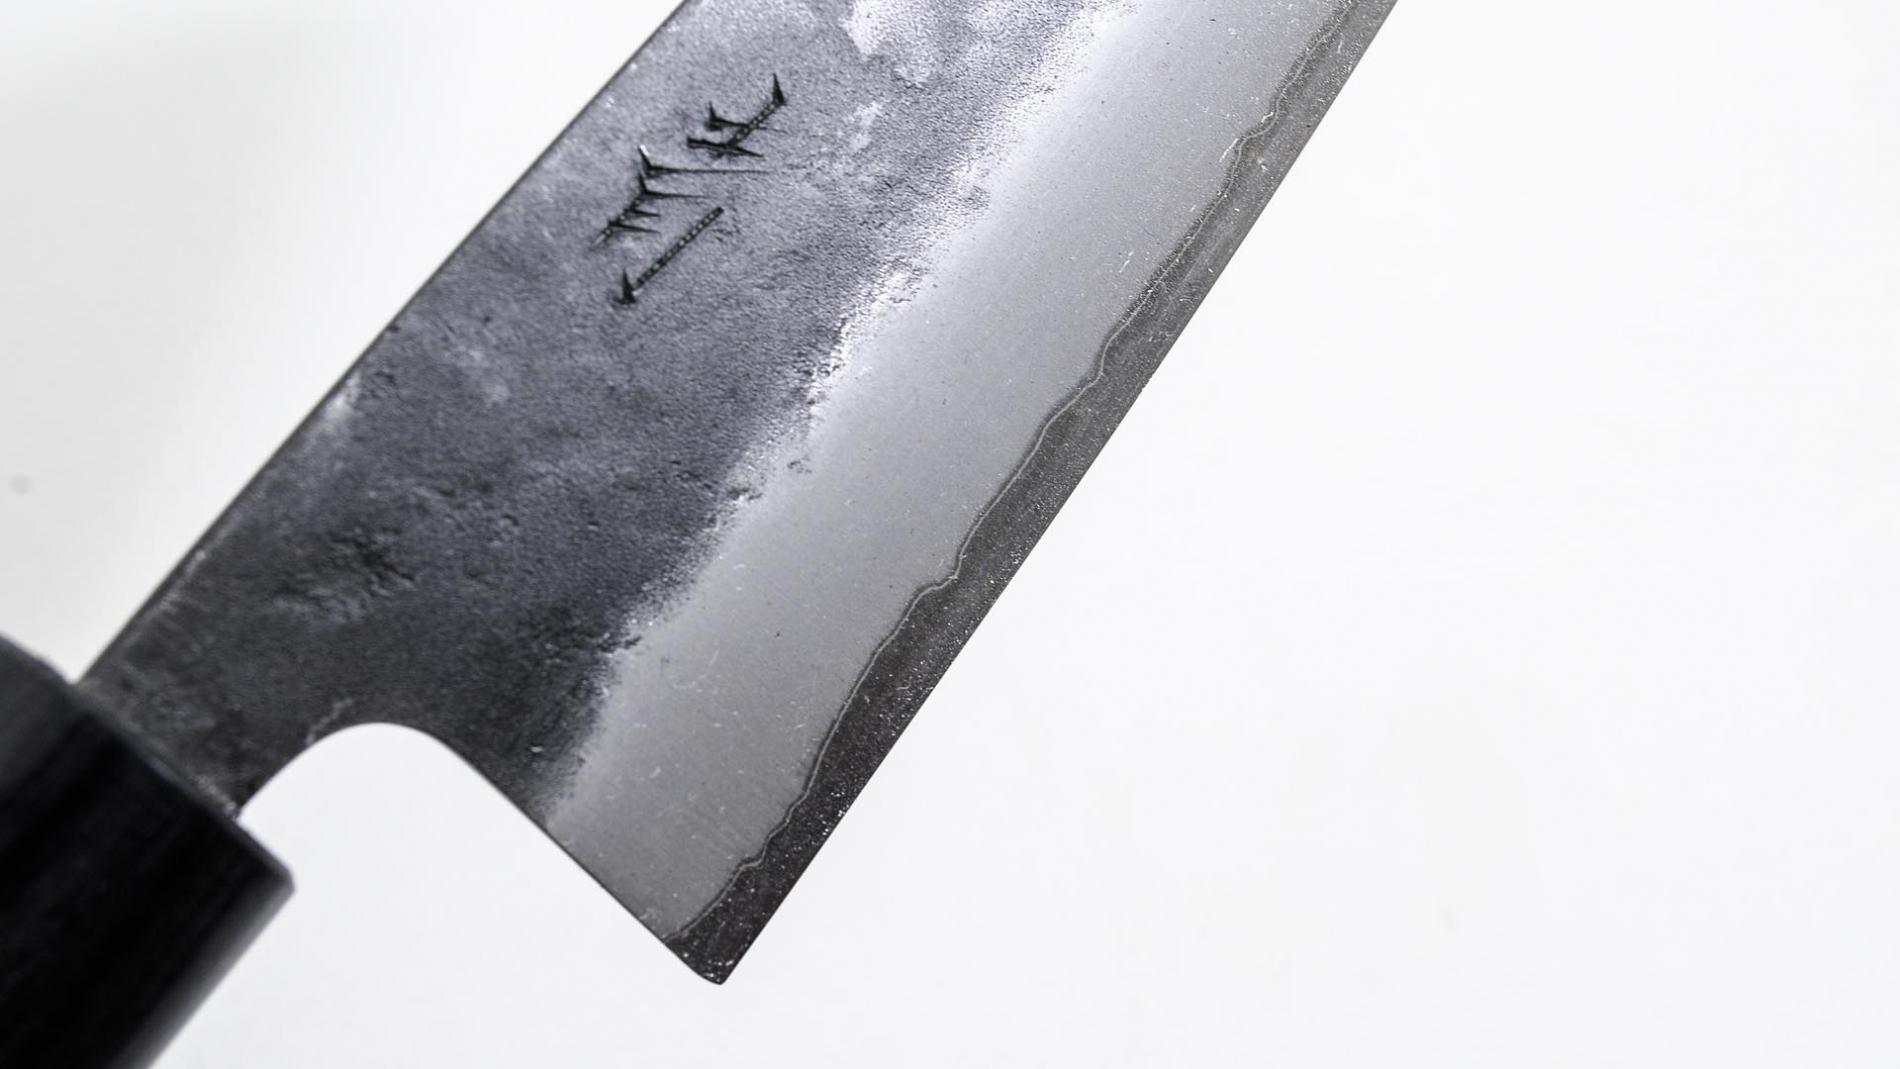 BS-16905-Cuchillo Santoku 165mm Aogami Blue Super+clad inox Kurouchi BS-16905-max-5.